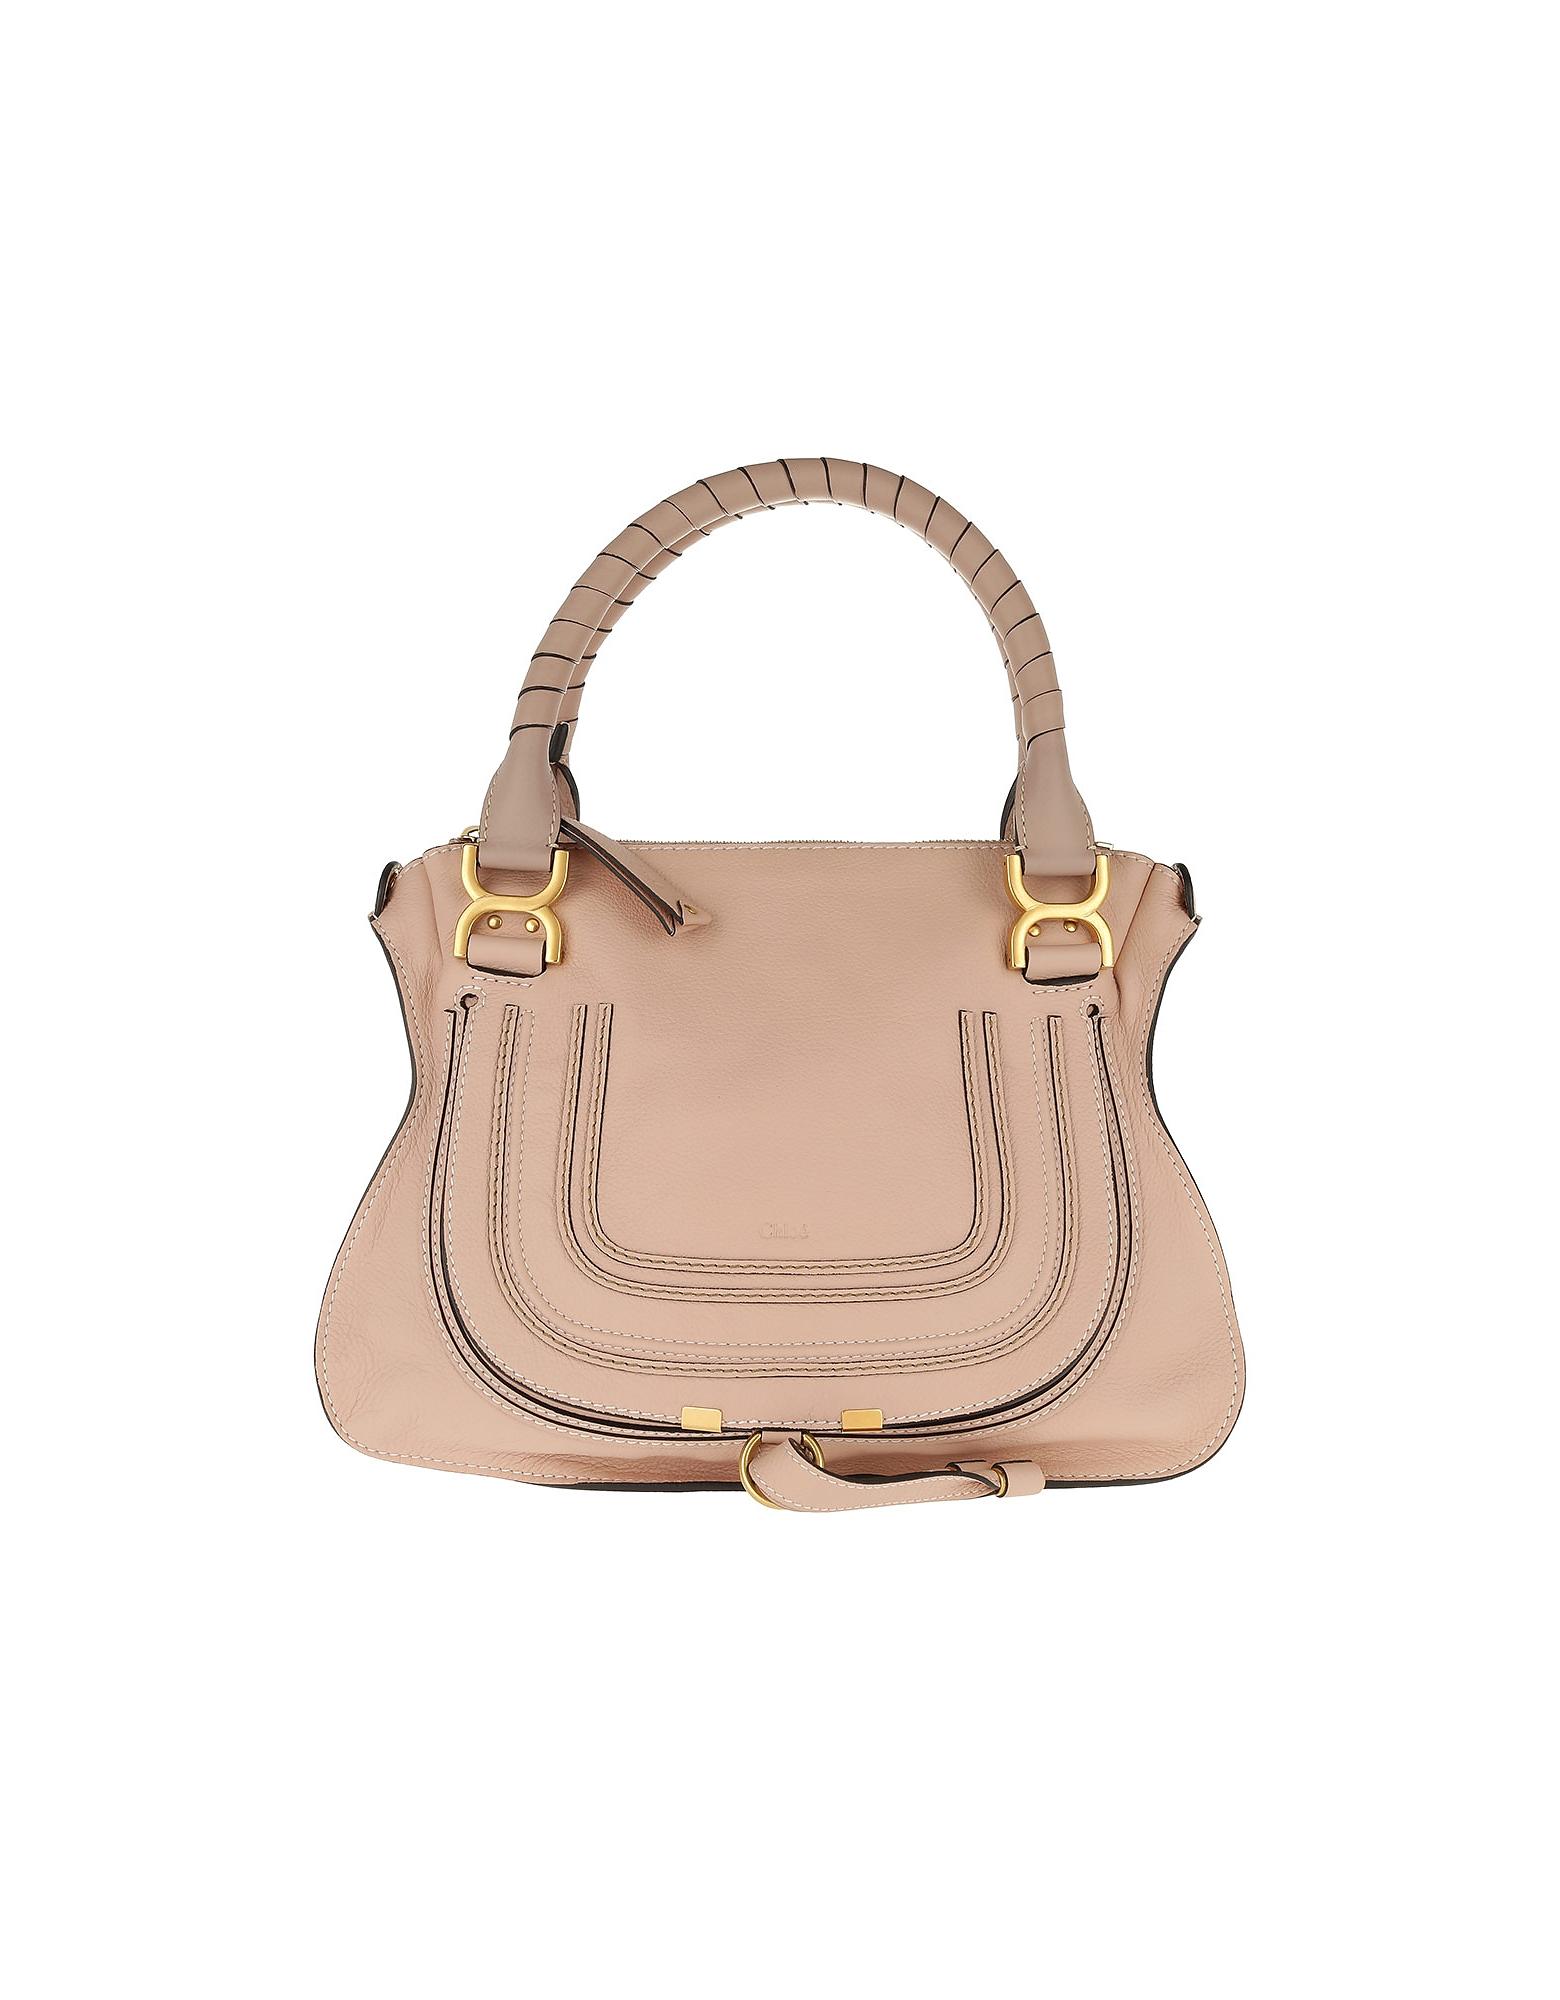 Chloe Designer Handbags, Marcie Porte Epaule Blush Nude (Luggage & Bags) photo